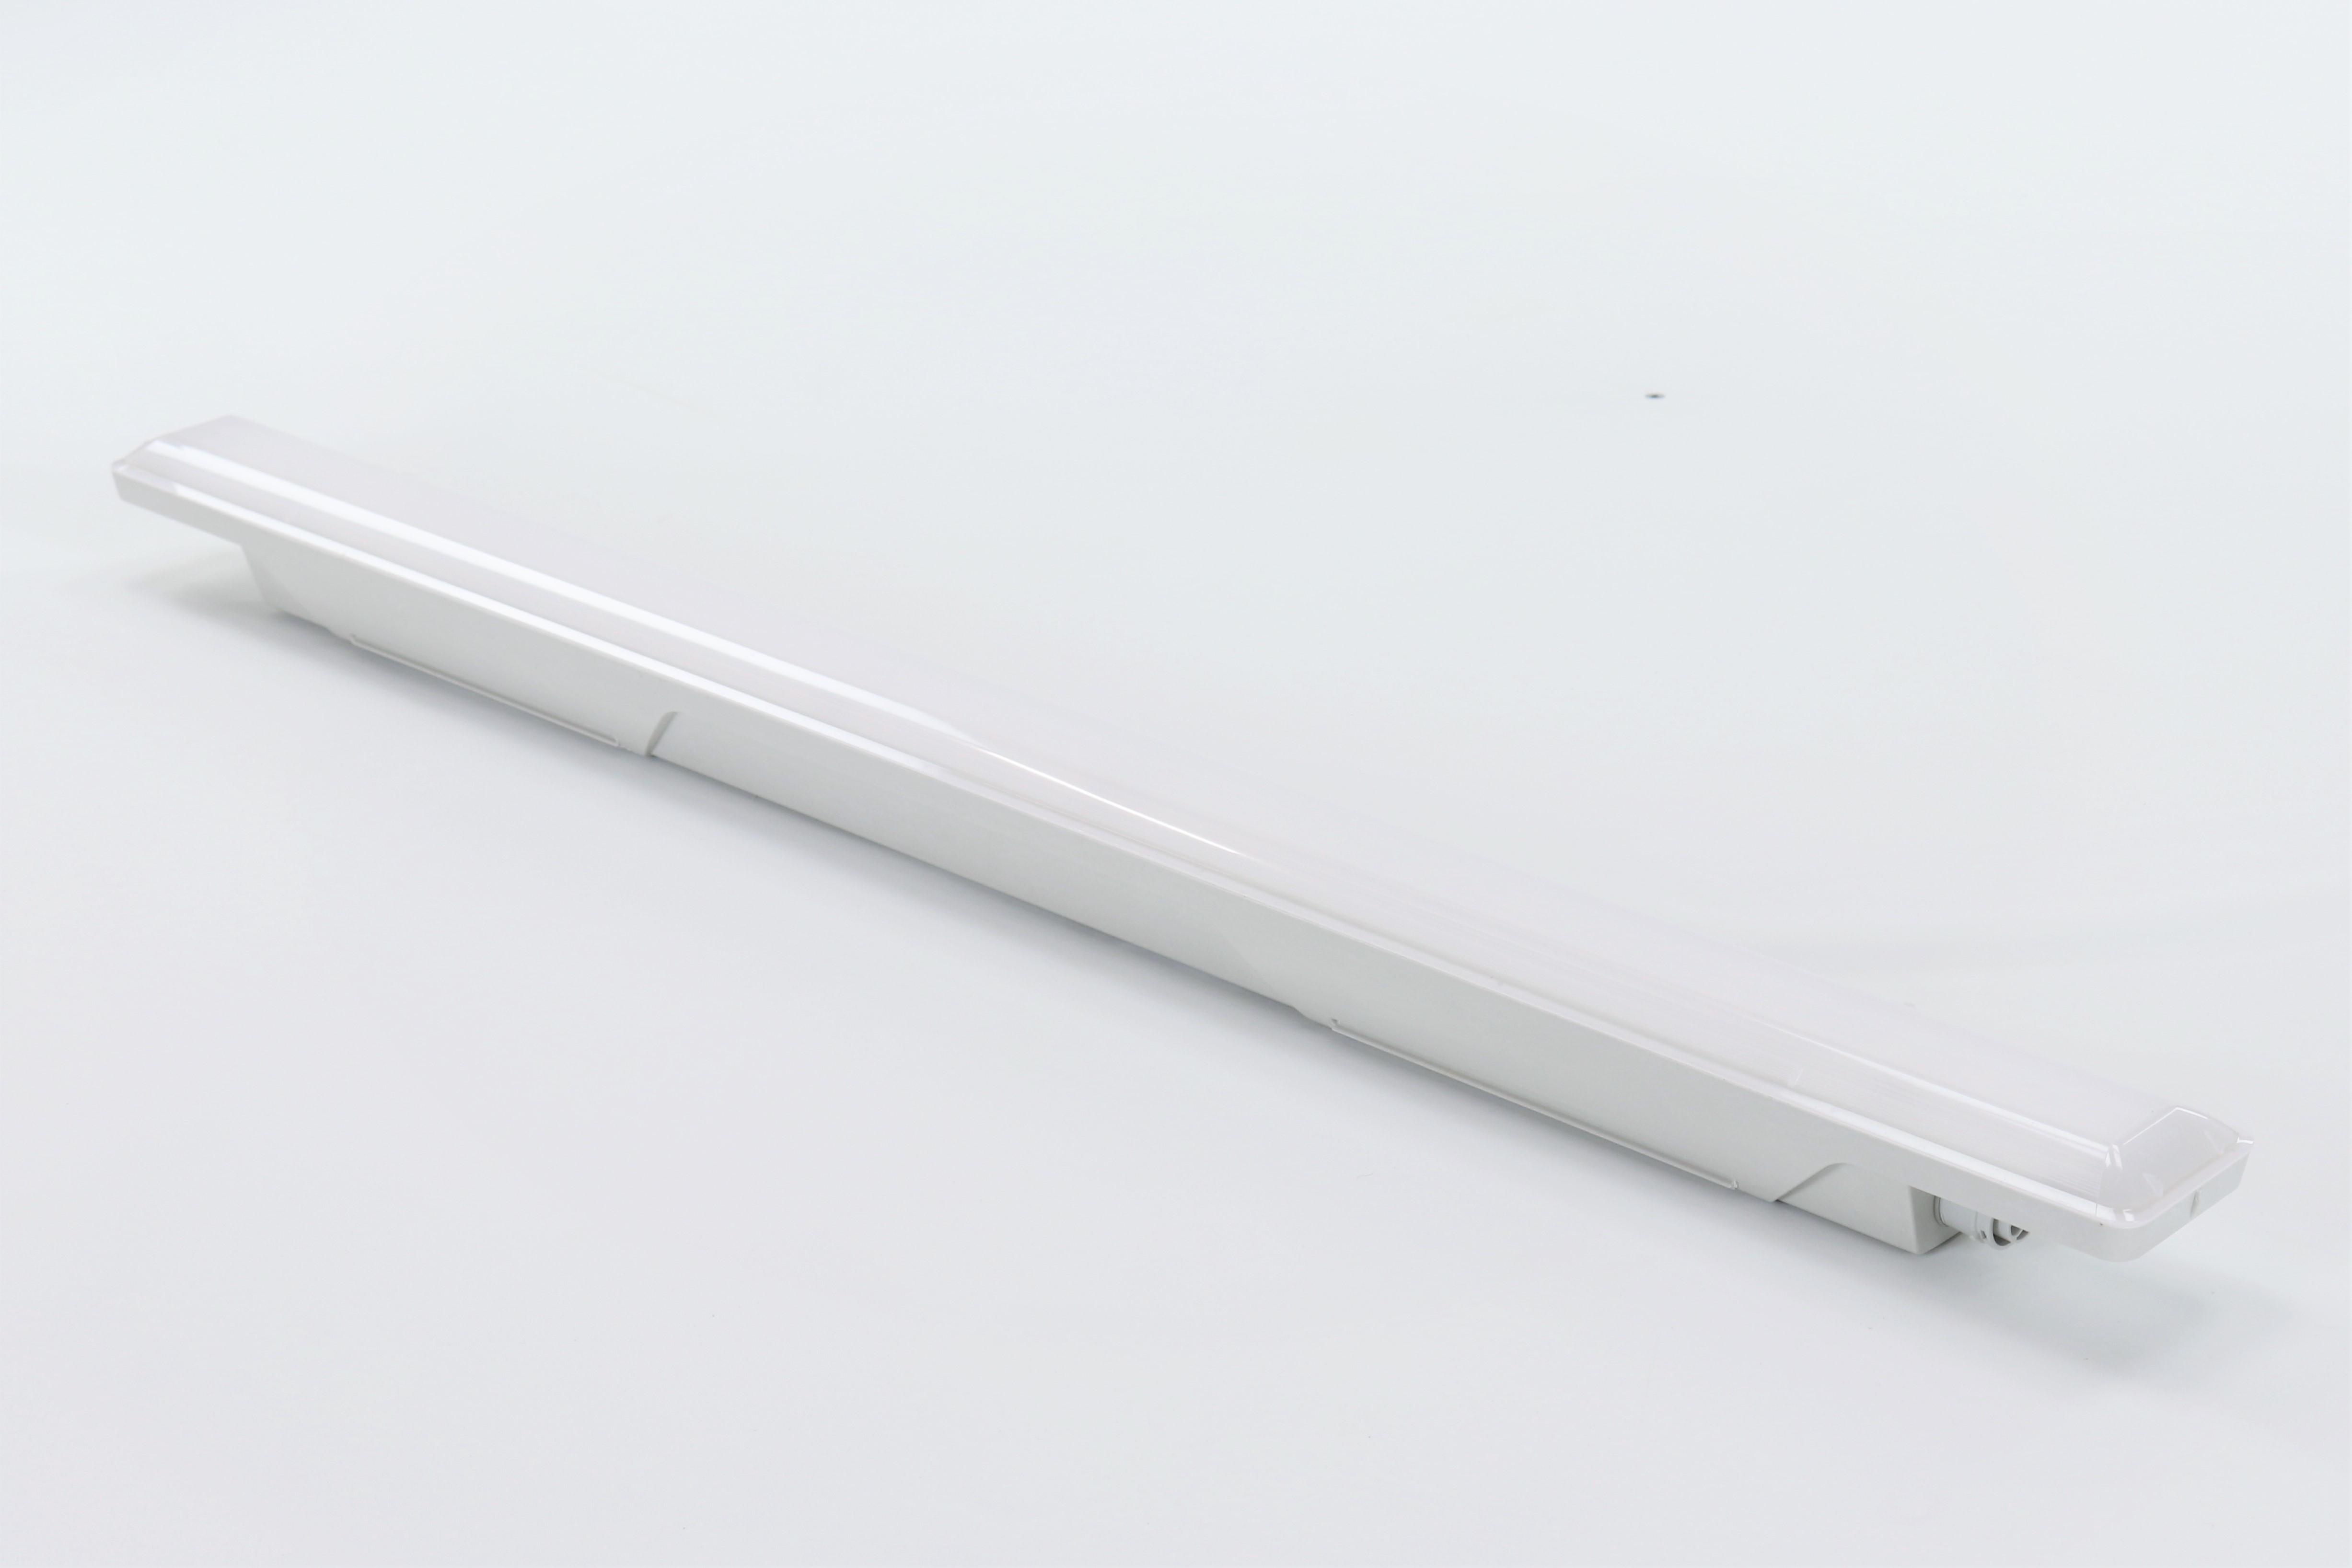 ZALUX LED-Feuchtraumleuchte Olexeon 1200 B 4000-840 ET TWS 110-277V